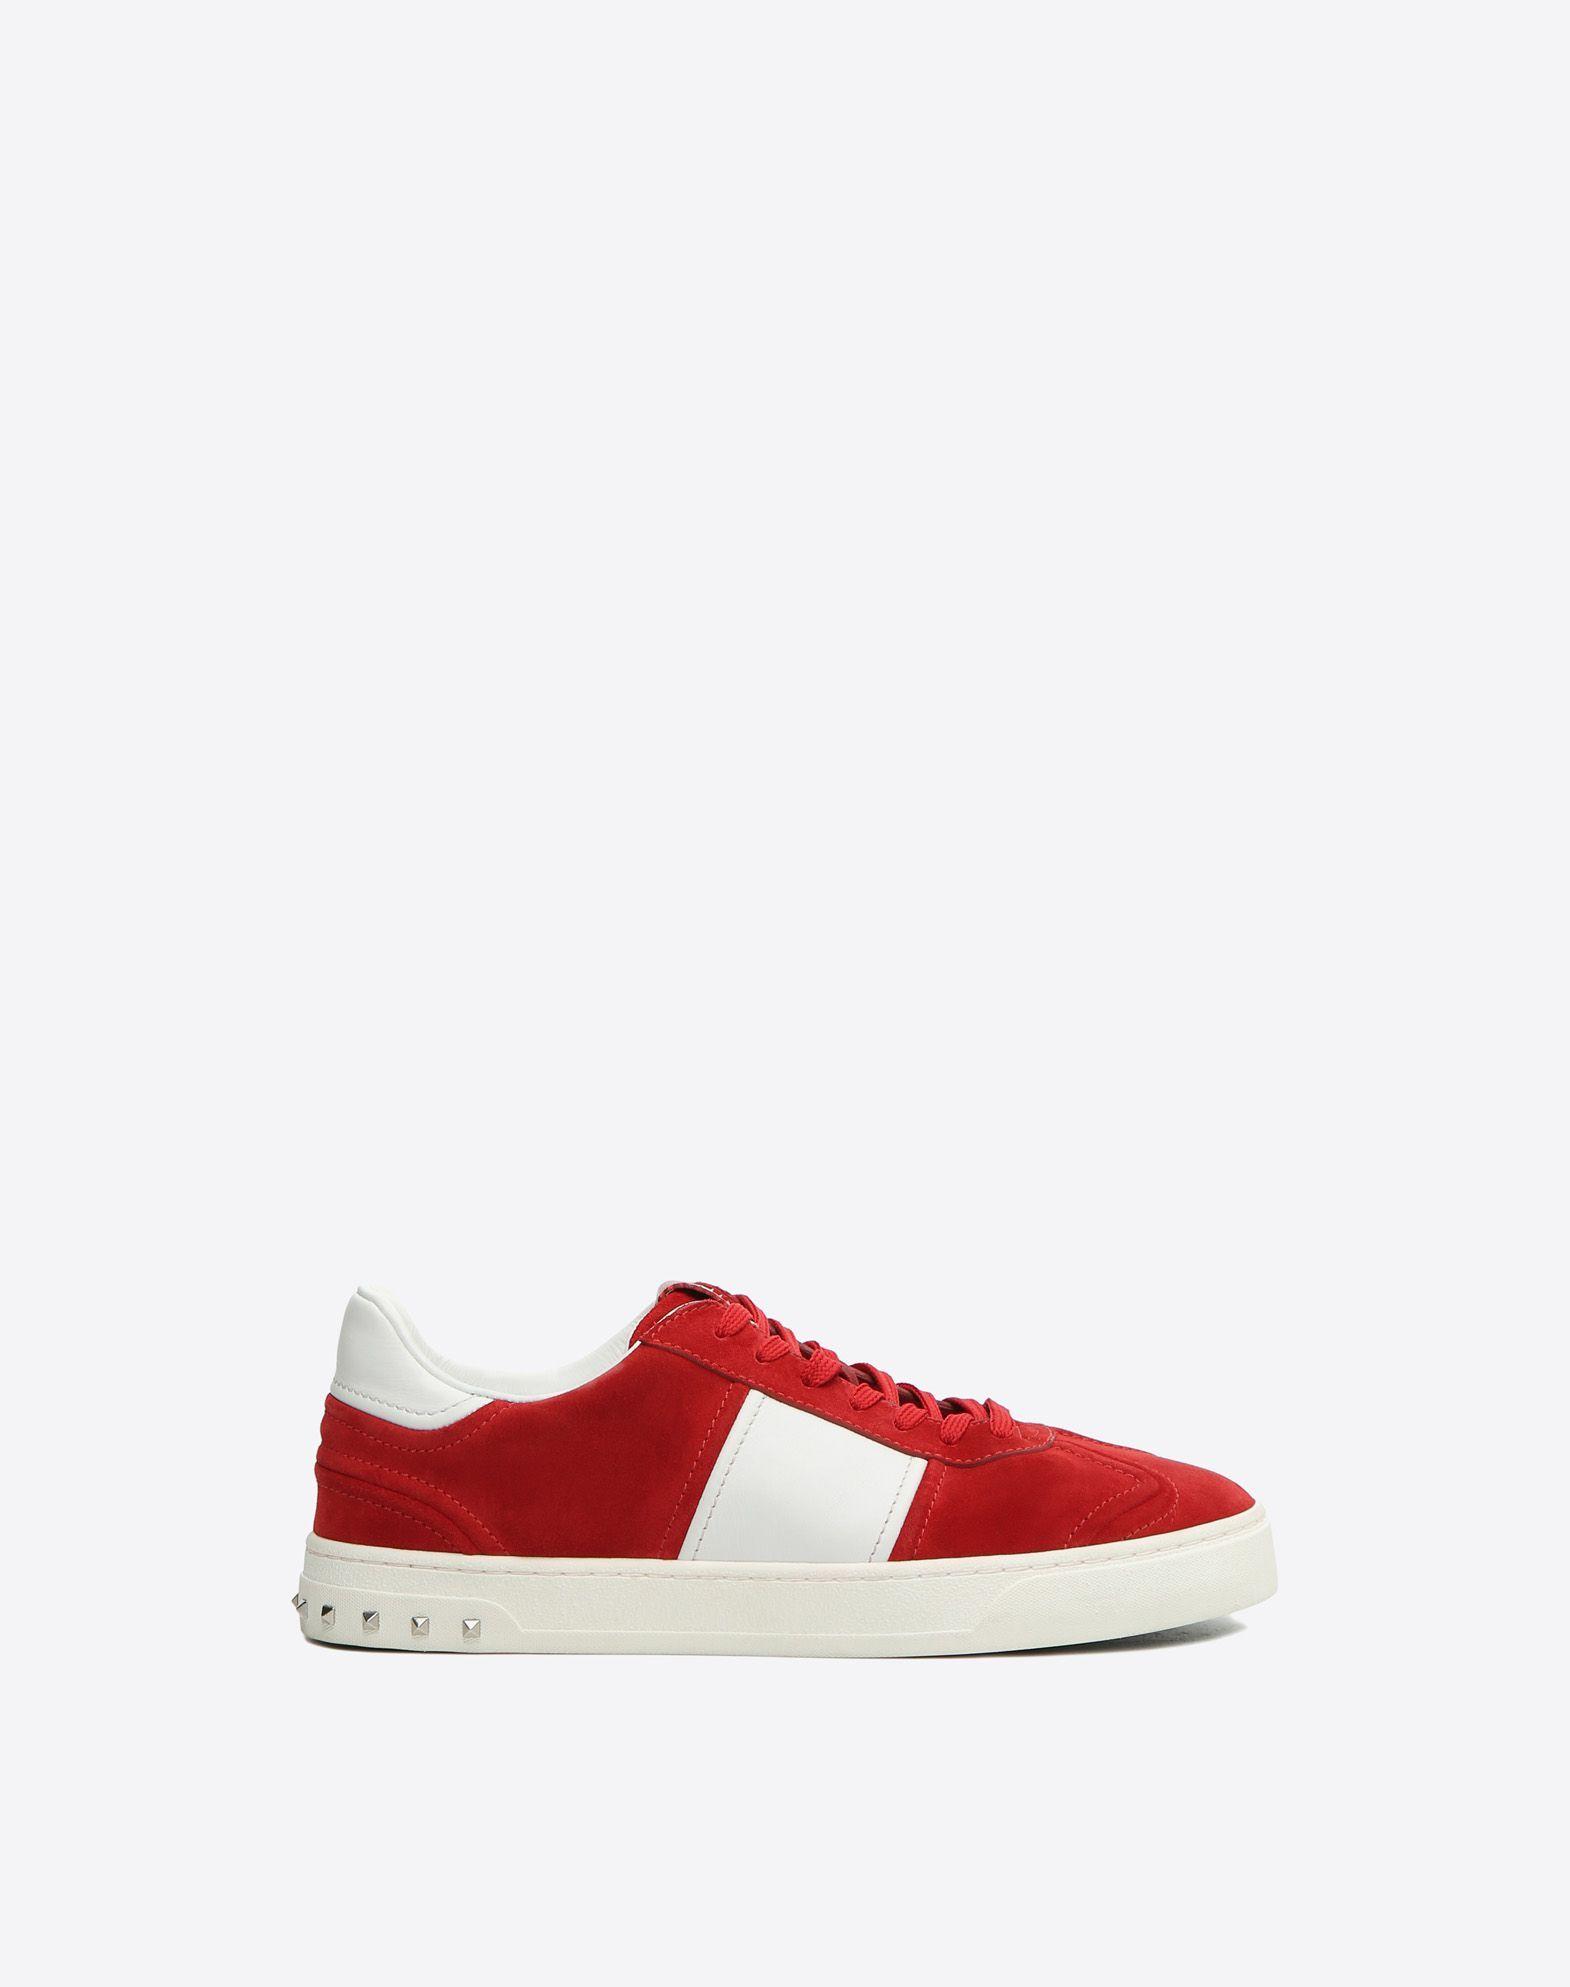 87e561de44e96 VALENTINO GARAVANI UOMO Flycrew Sneaker LOW-TOP SNEAKERS U f ...